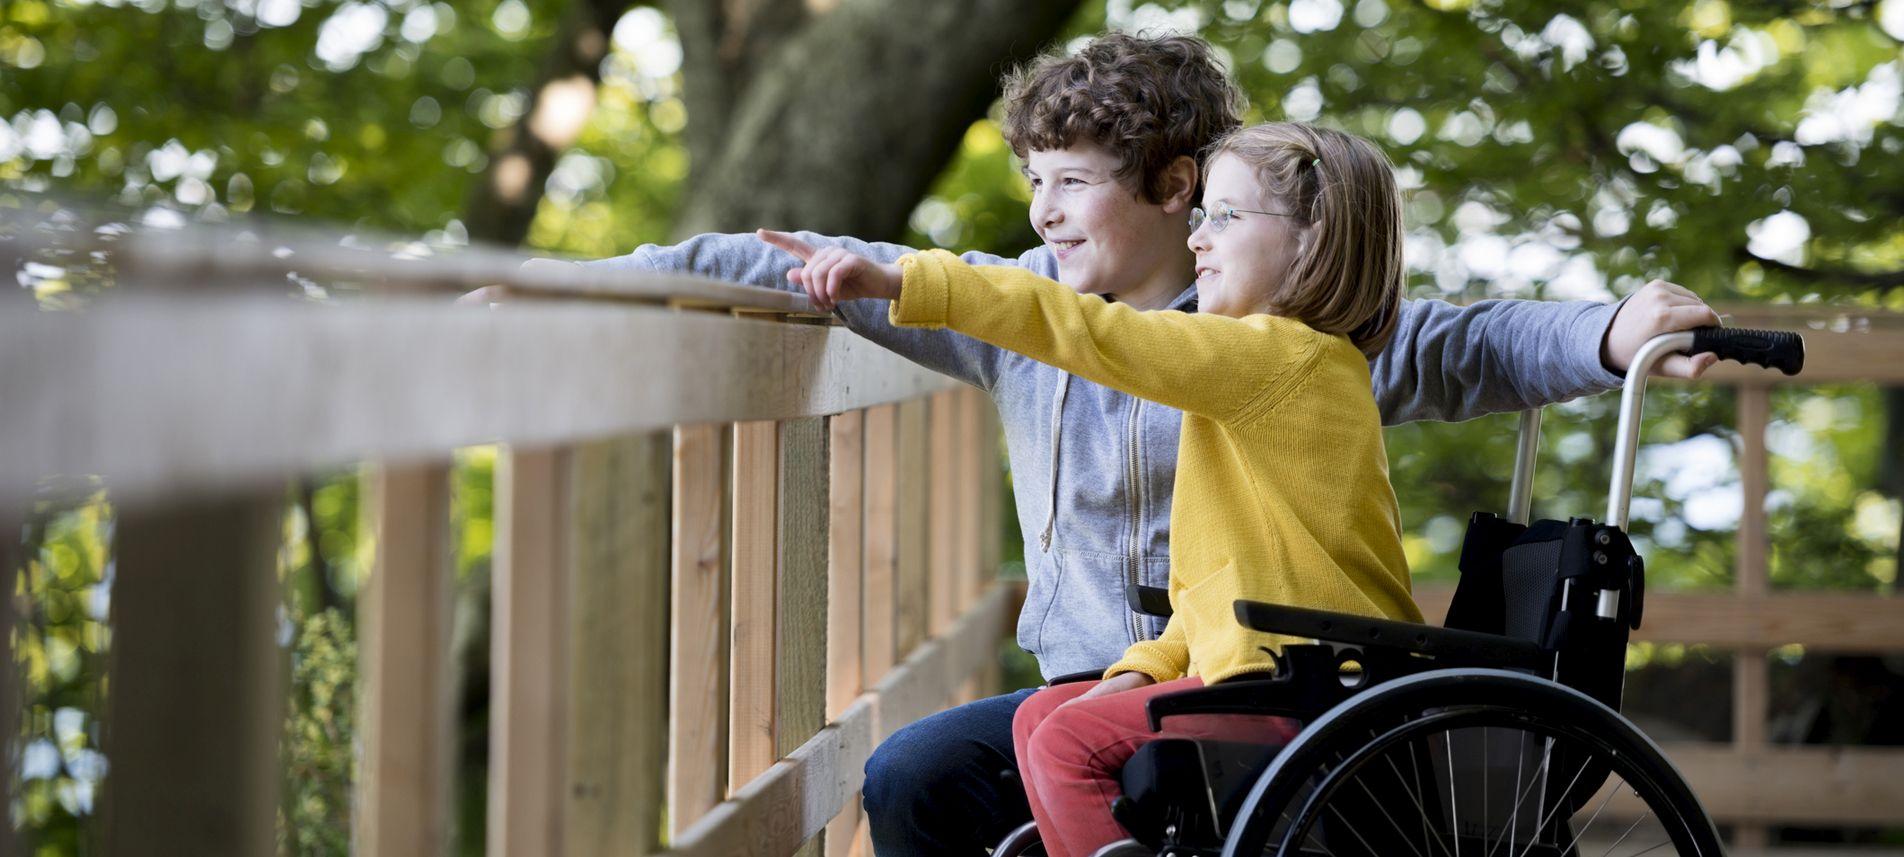 Behindertendaten-WebsitesHerzstein-Image-Mempeln